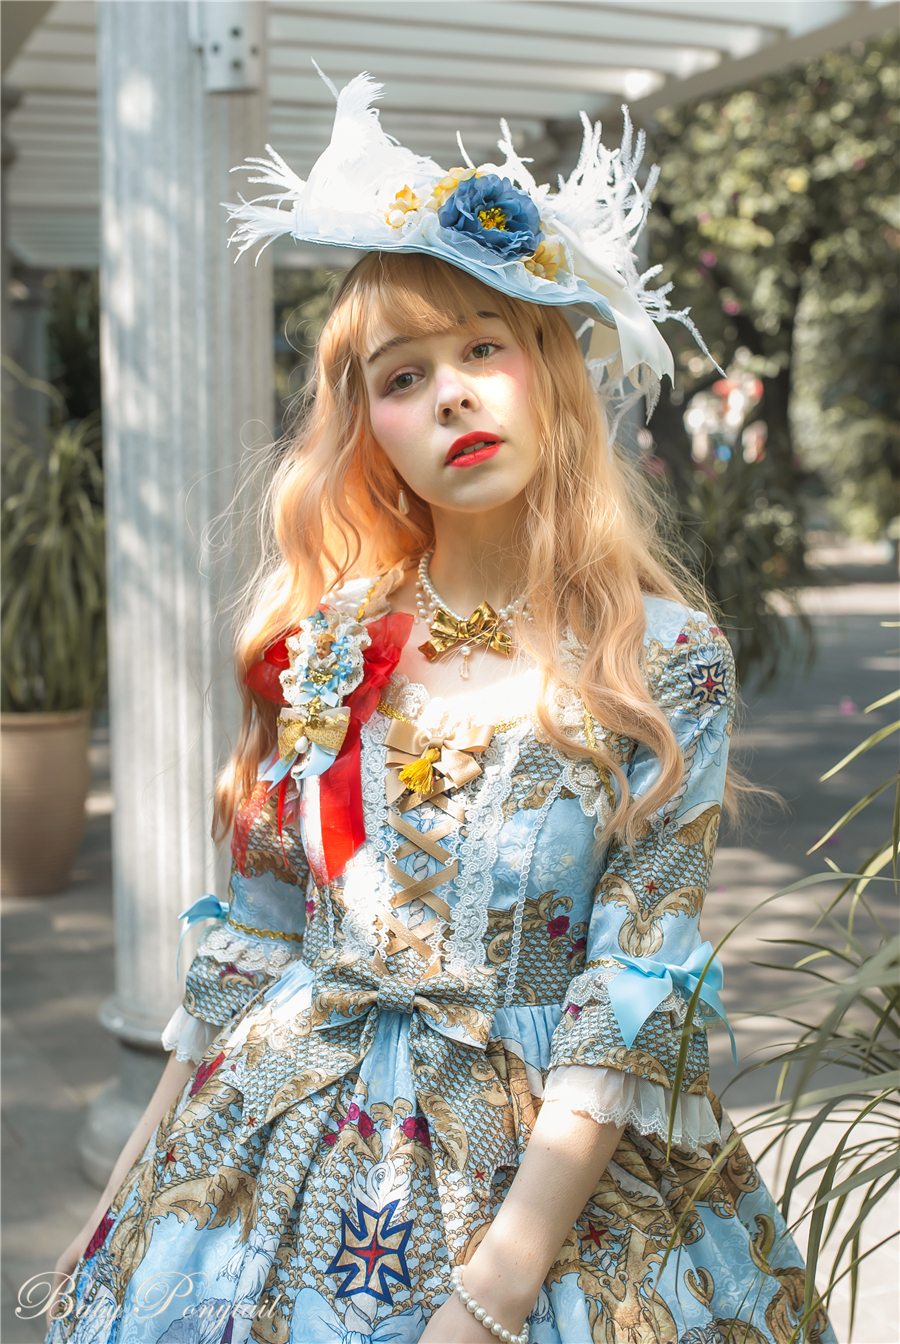 Baby Ponytail_Circus Princess_Sax OP_Claudia_08.jpg